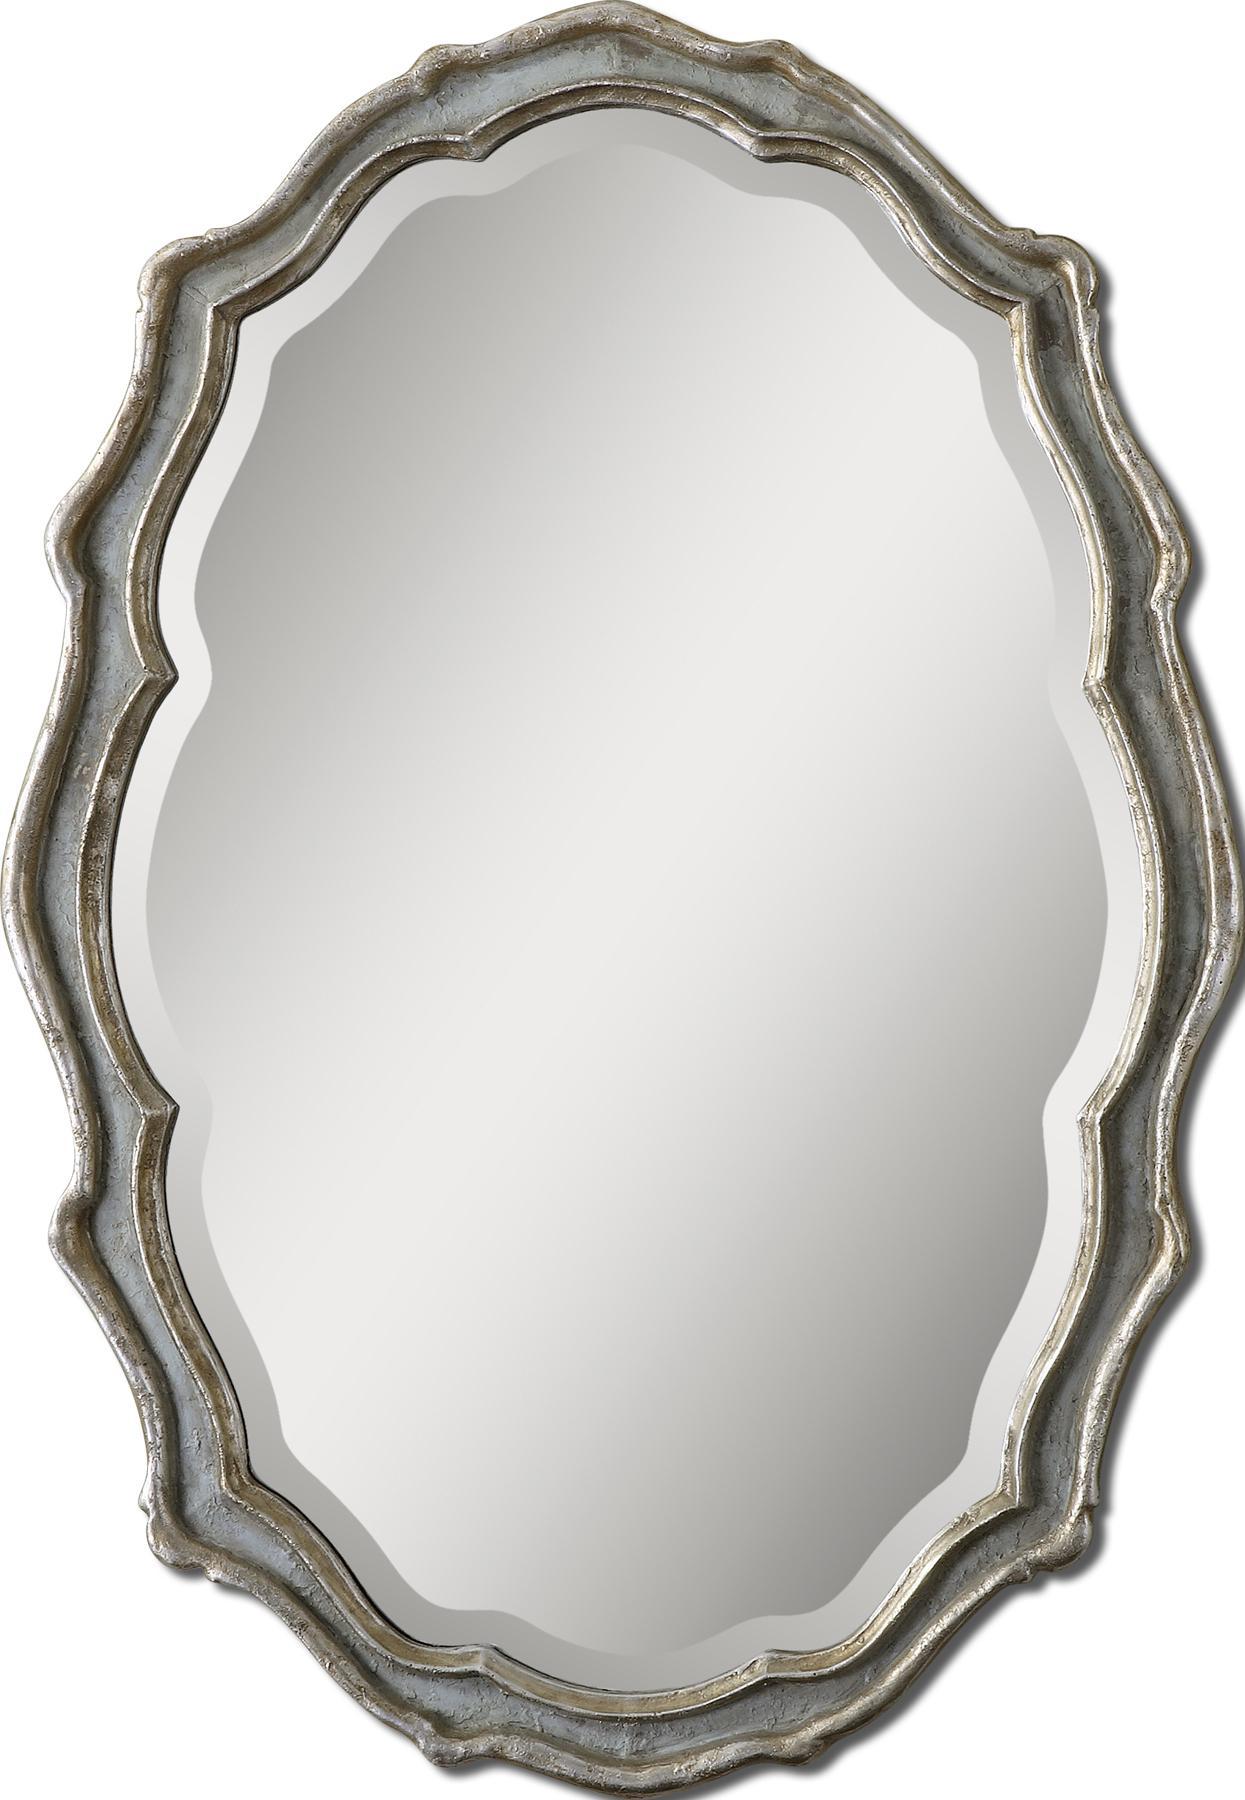 Uttermost Mirrors Dorgali - Item Number: 12832